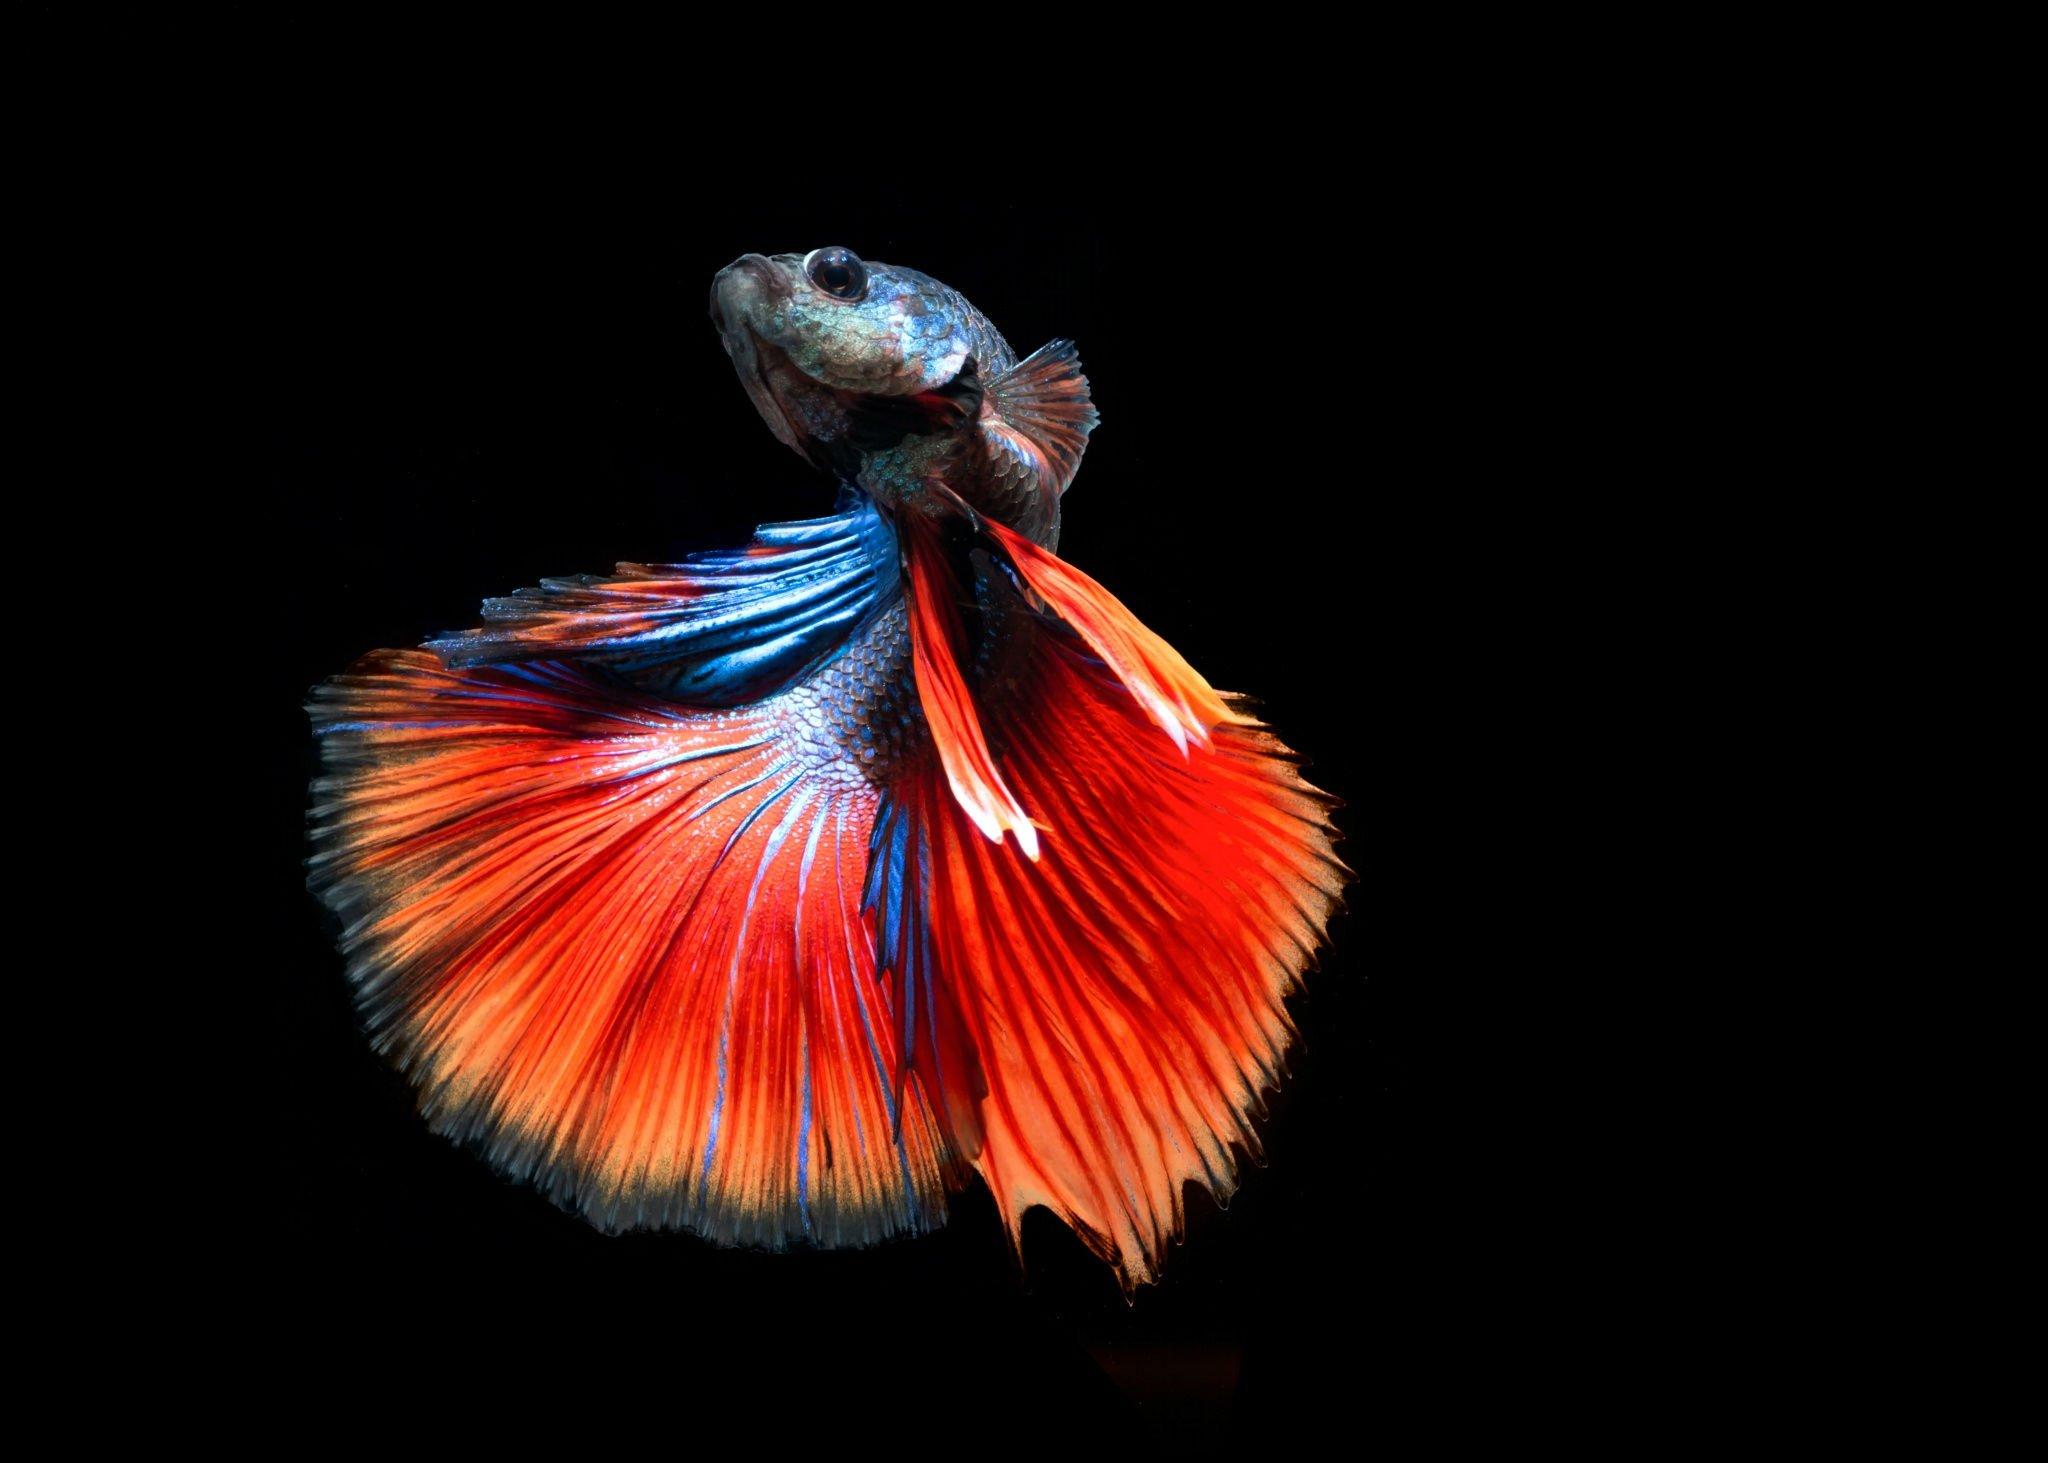 Hd Fish Live Wallpaper For Pc Betta Siamese Fighting Fish Underwater Tropical